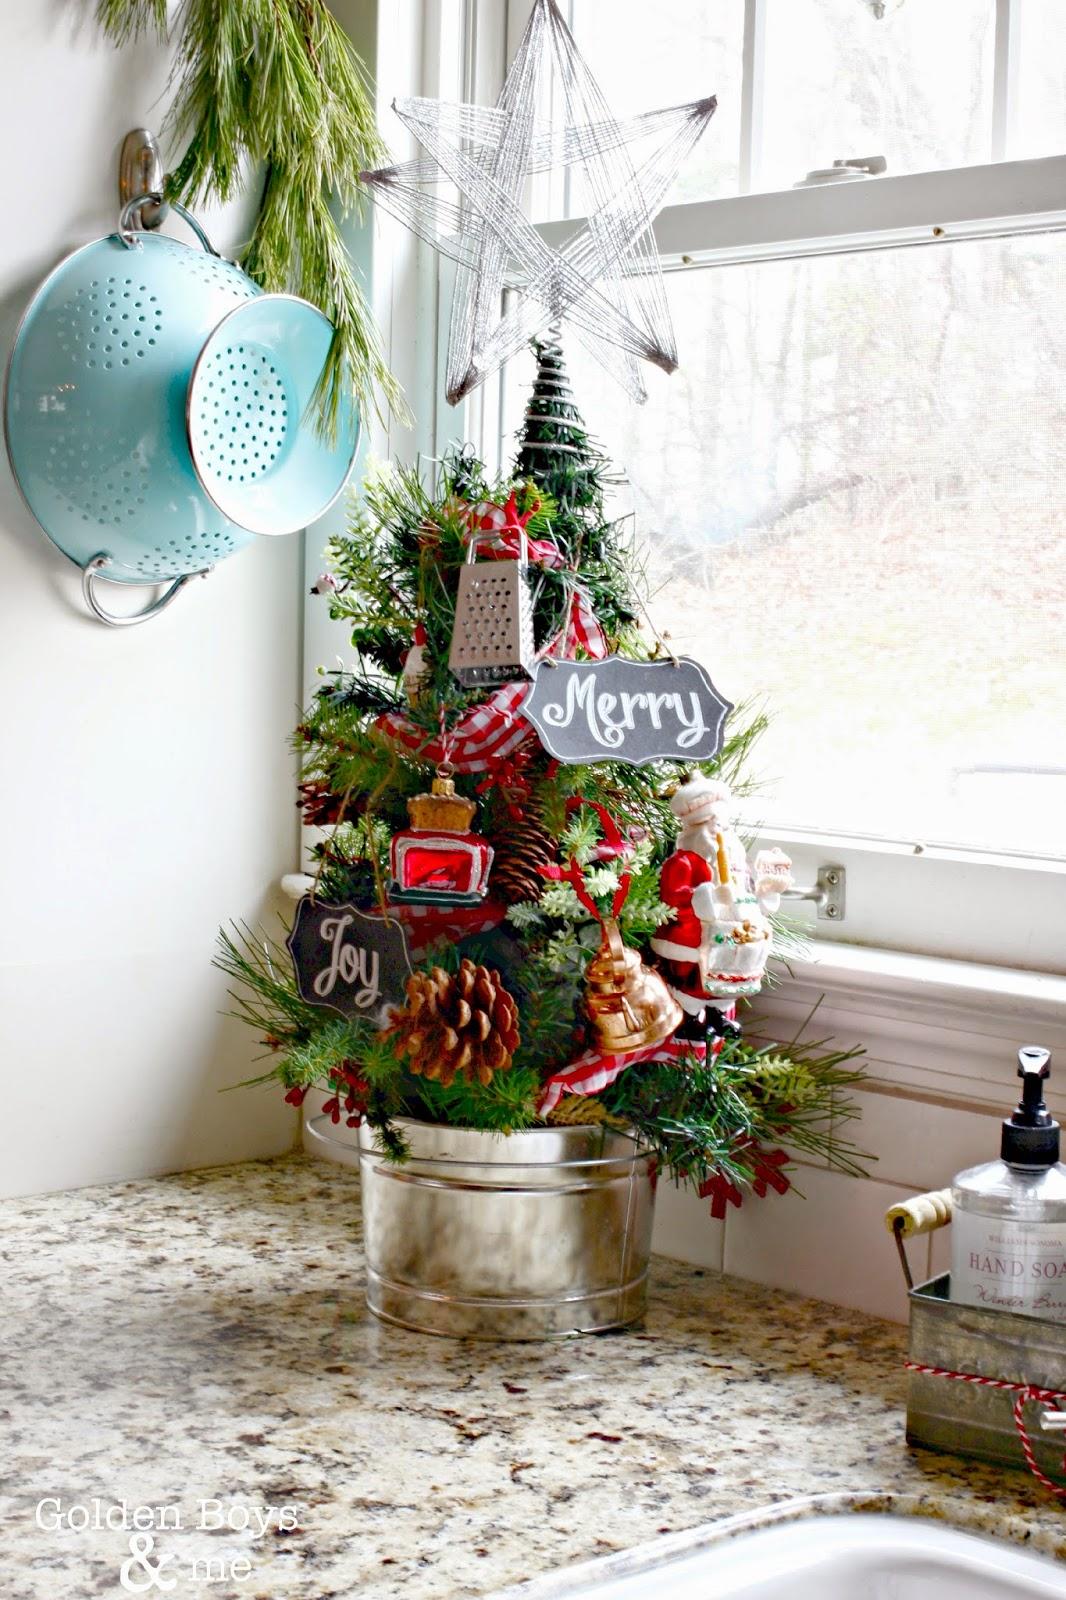 Kitchen Christmas tree with Sur La Table ornaments-www.goldenboysandme.com